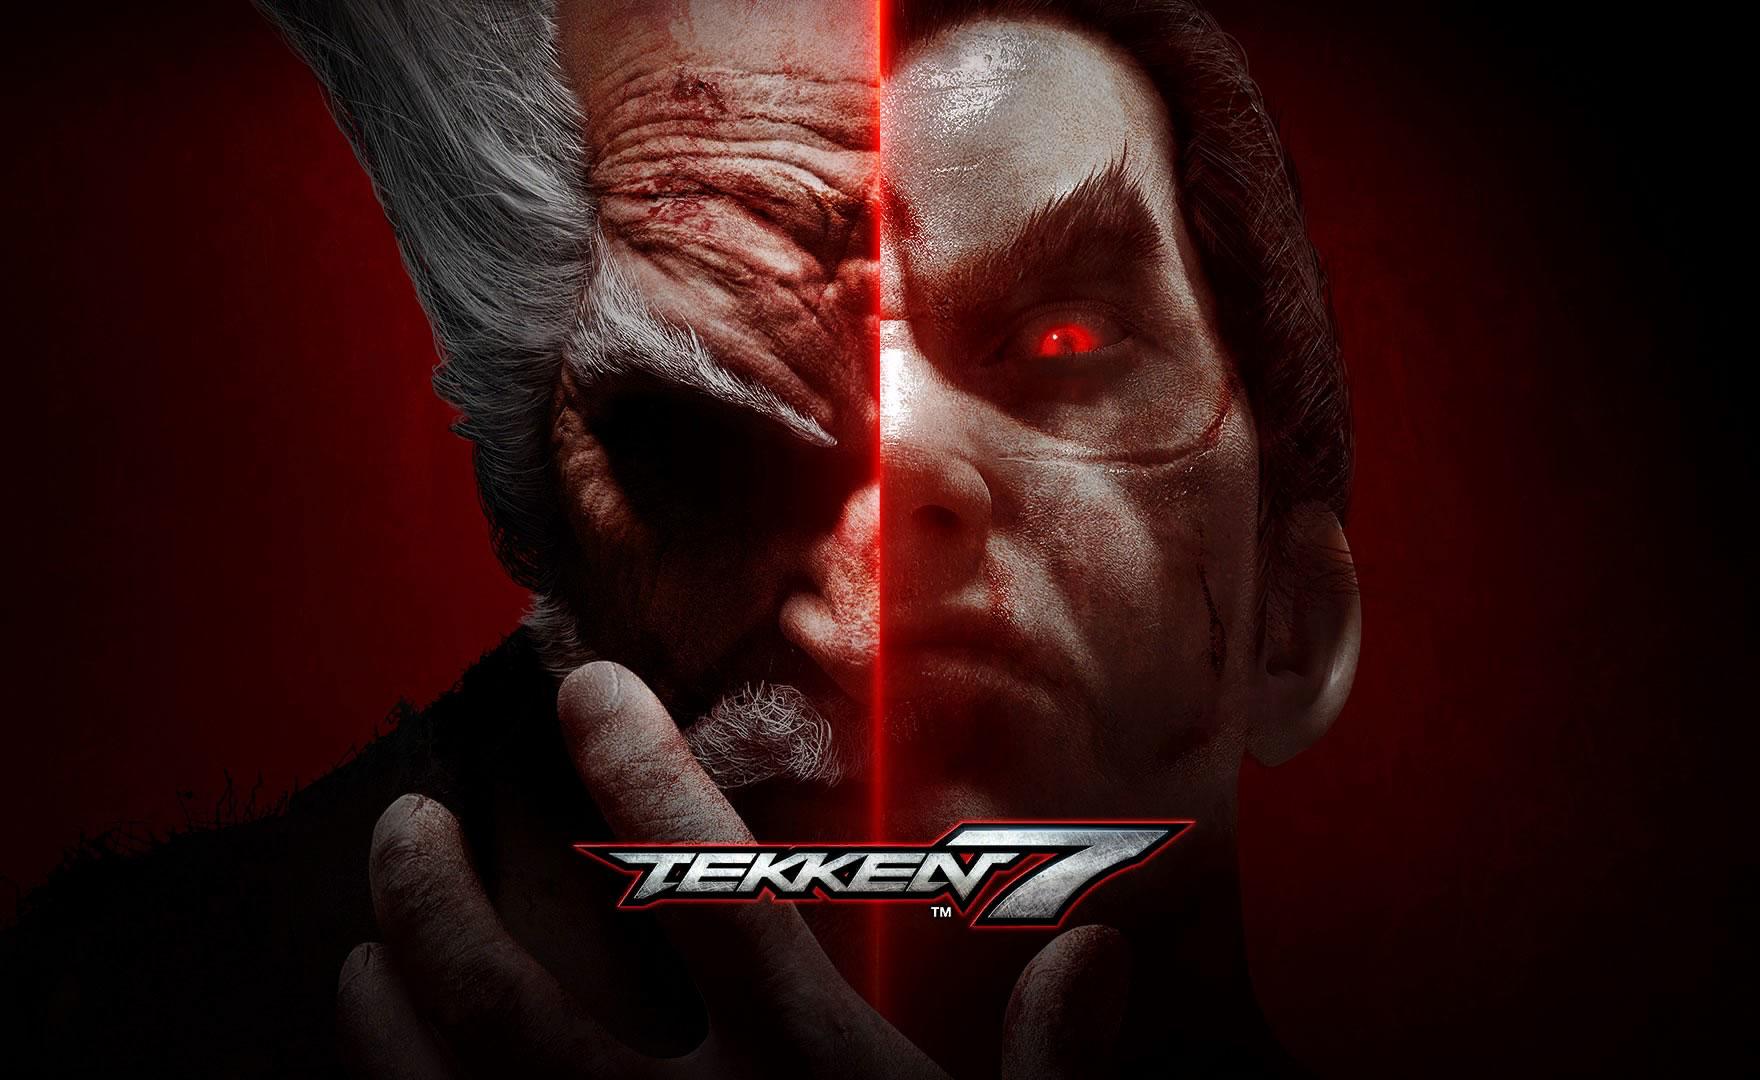 Tekken 7, data di lancio del Season Pass 3